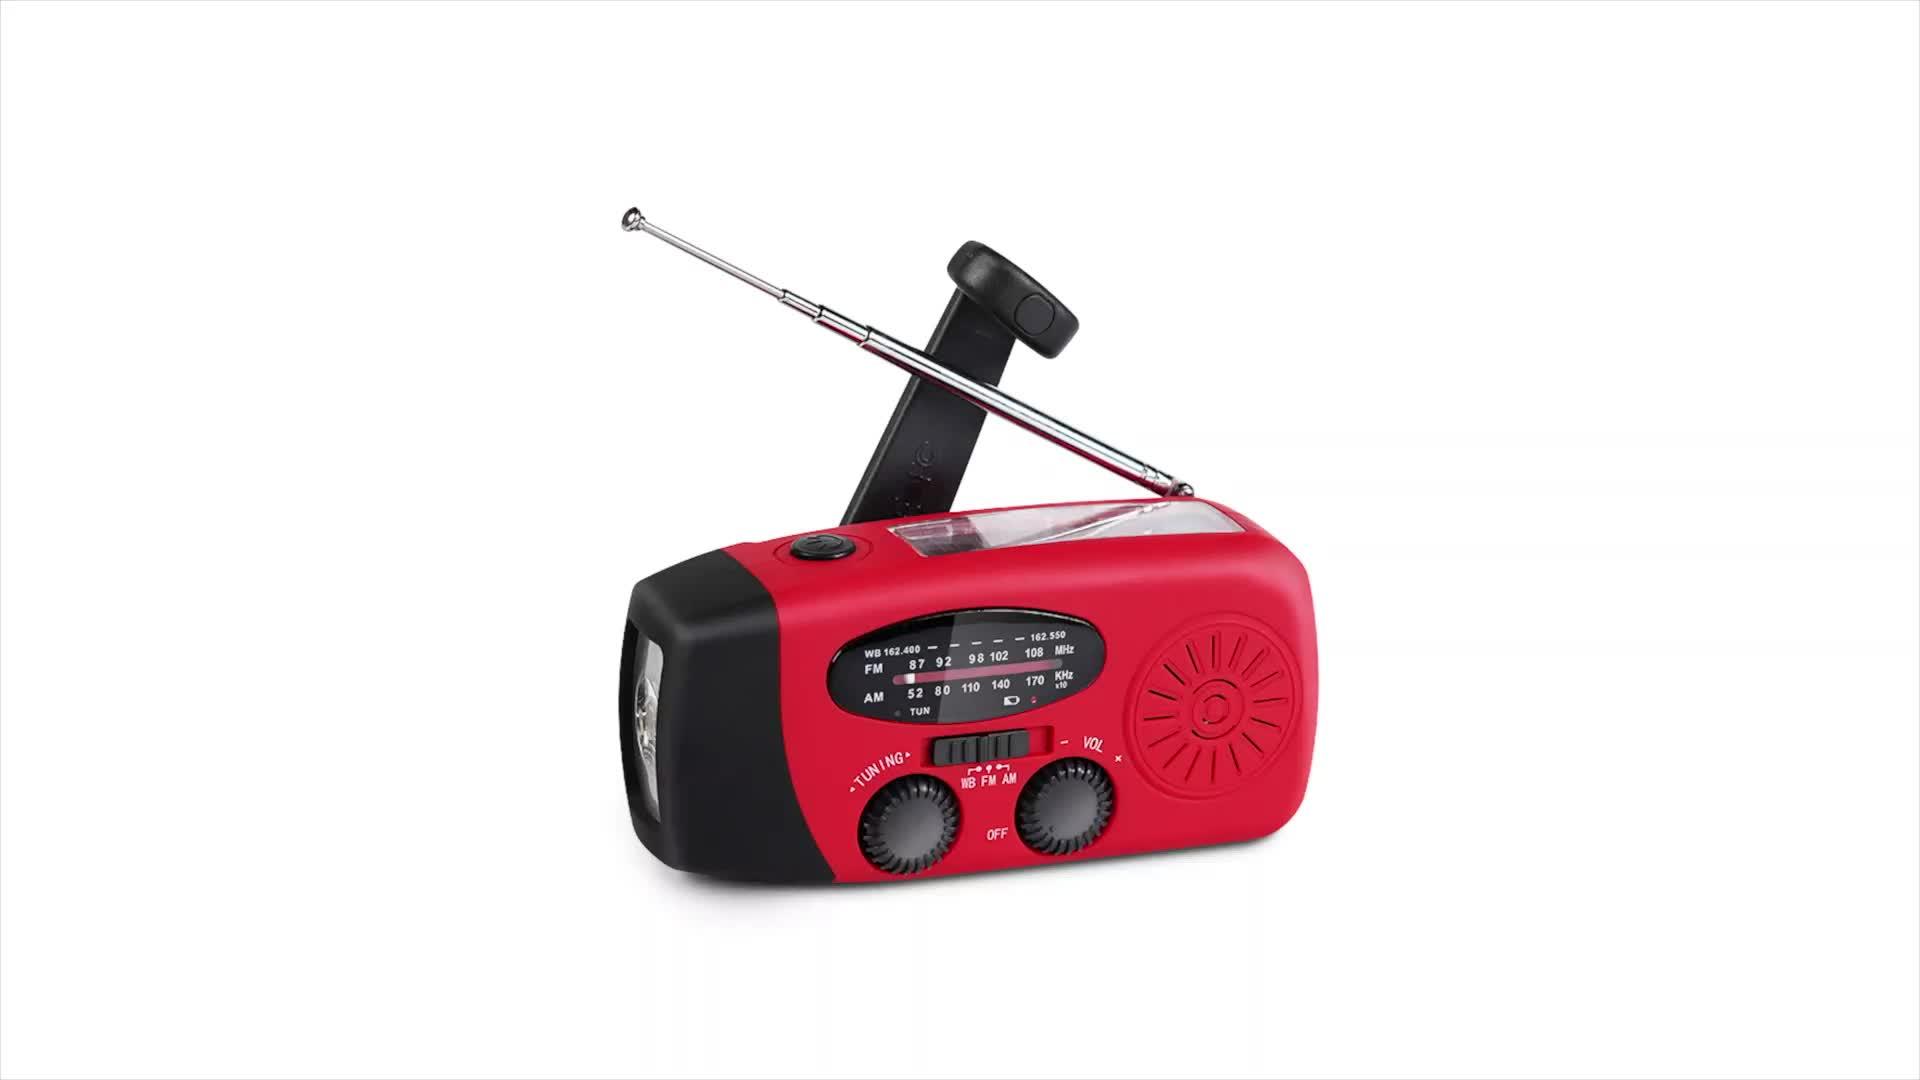 Dínamo noaa weather emergency solar portátil am fm rádio de bolso mini